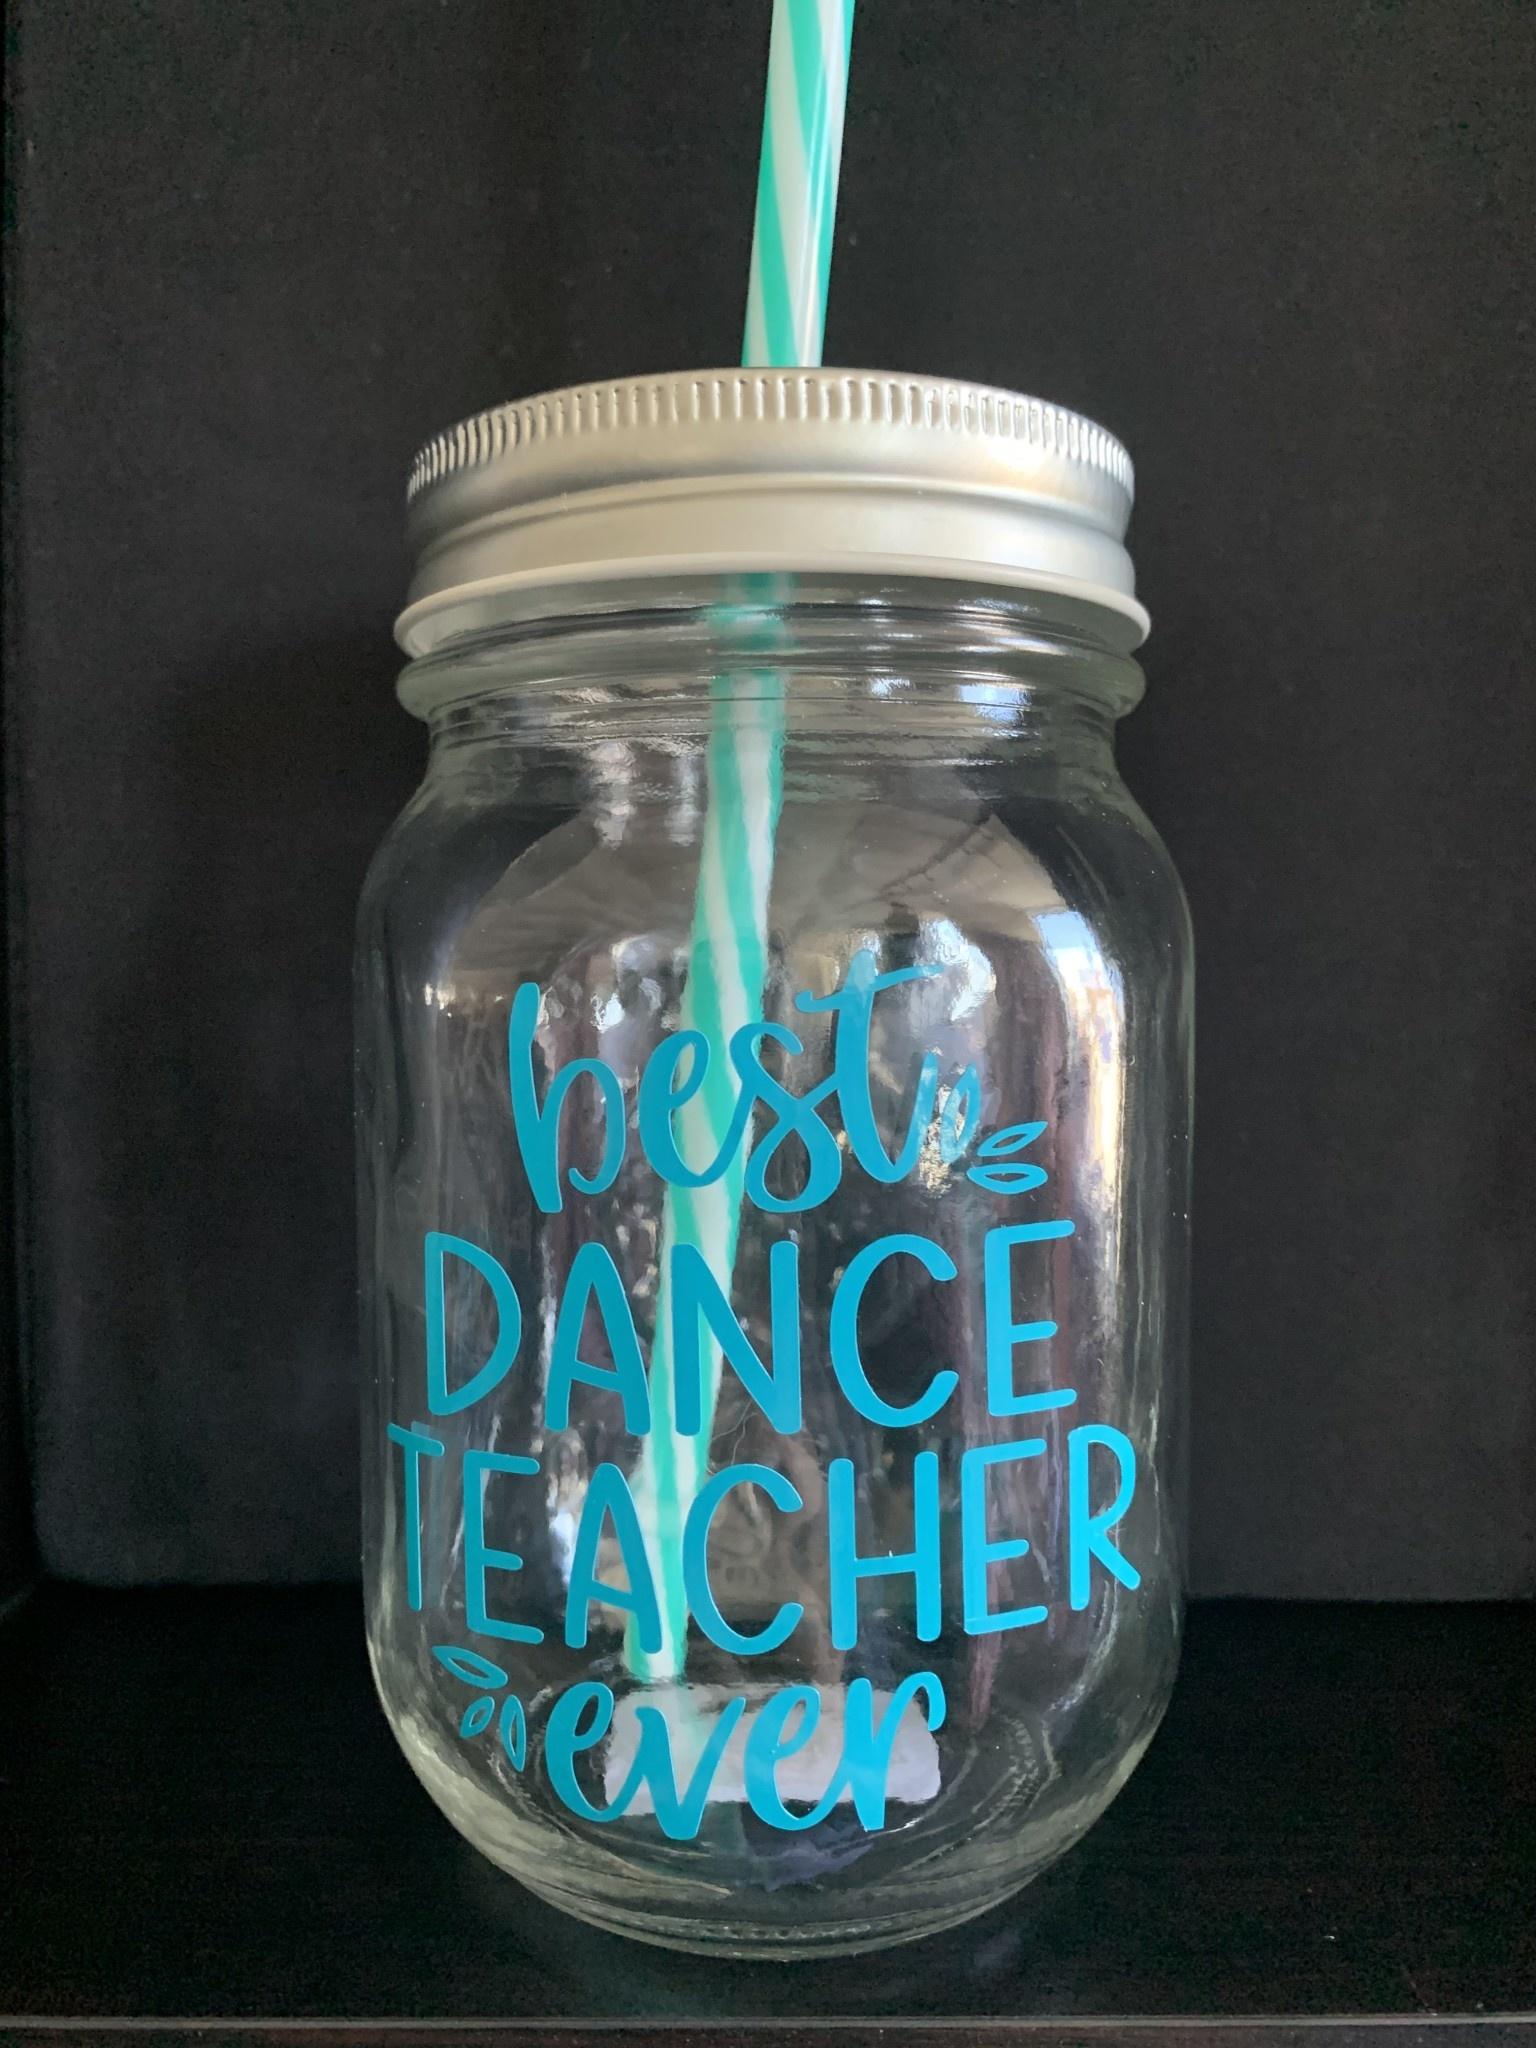 Knotted & Twisted Dance Teacher Mason Jar